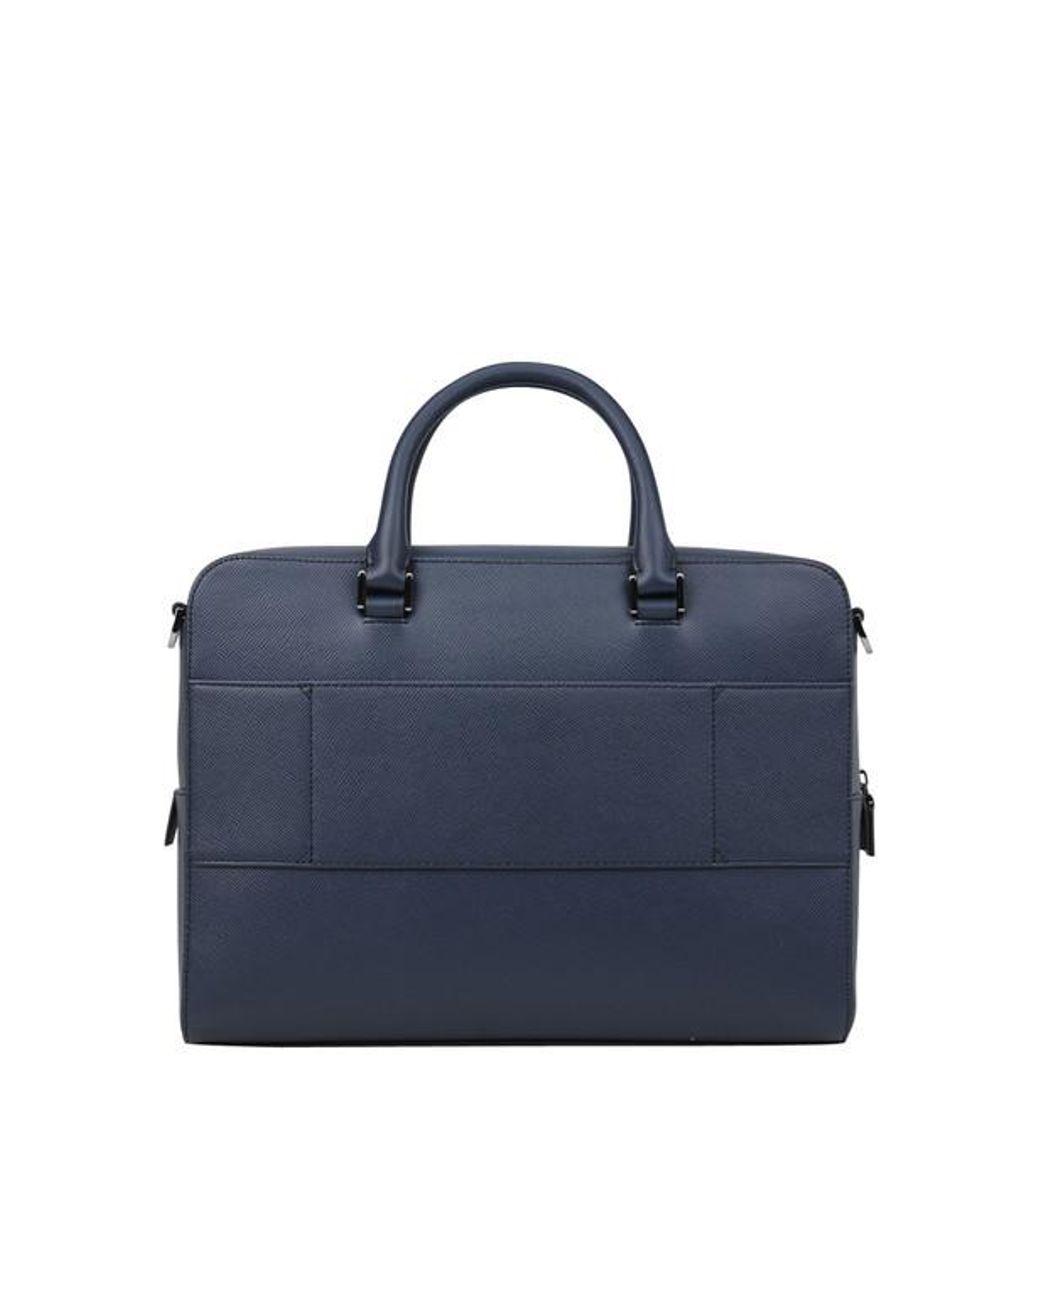 cbedea6217 Sac porte-documents zippé en cuir saffiano homme de coloris bleu